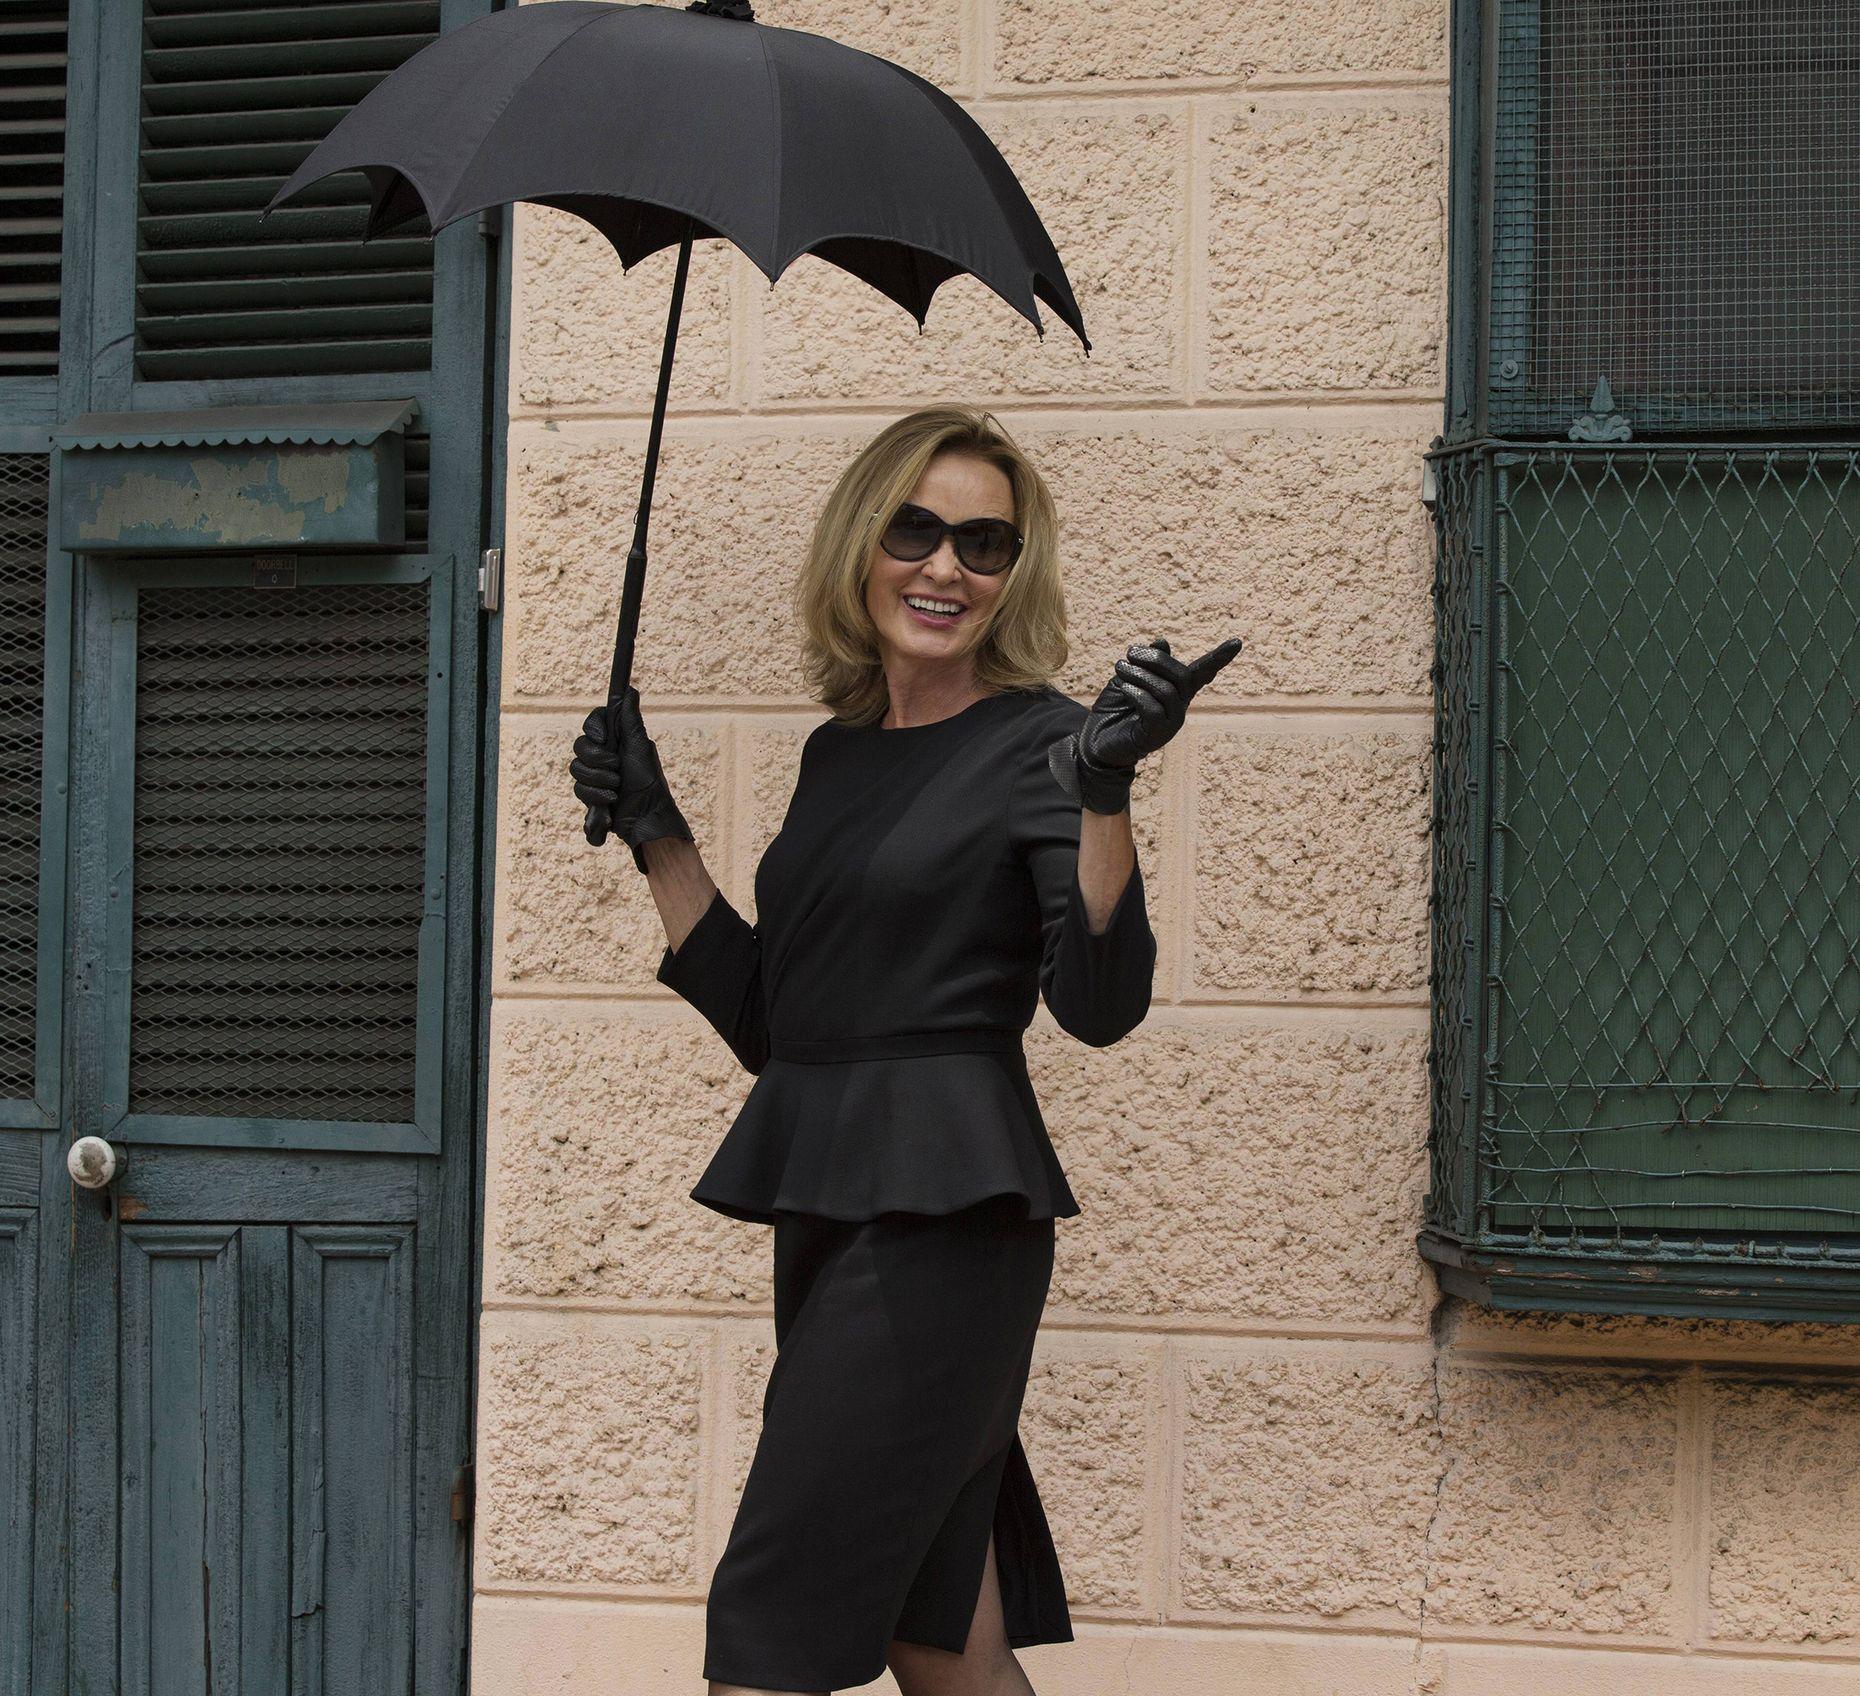 Jessica Lange in <em>American Horror Story<em/> Michele K. Short/ FX